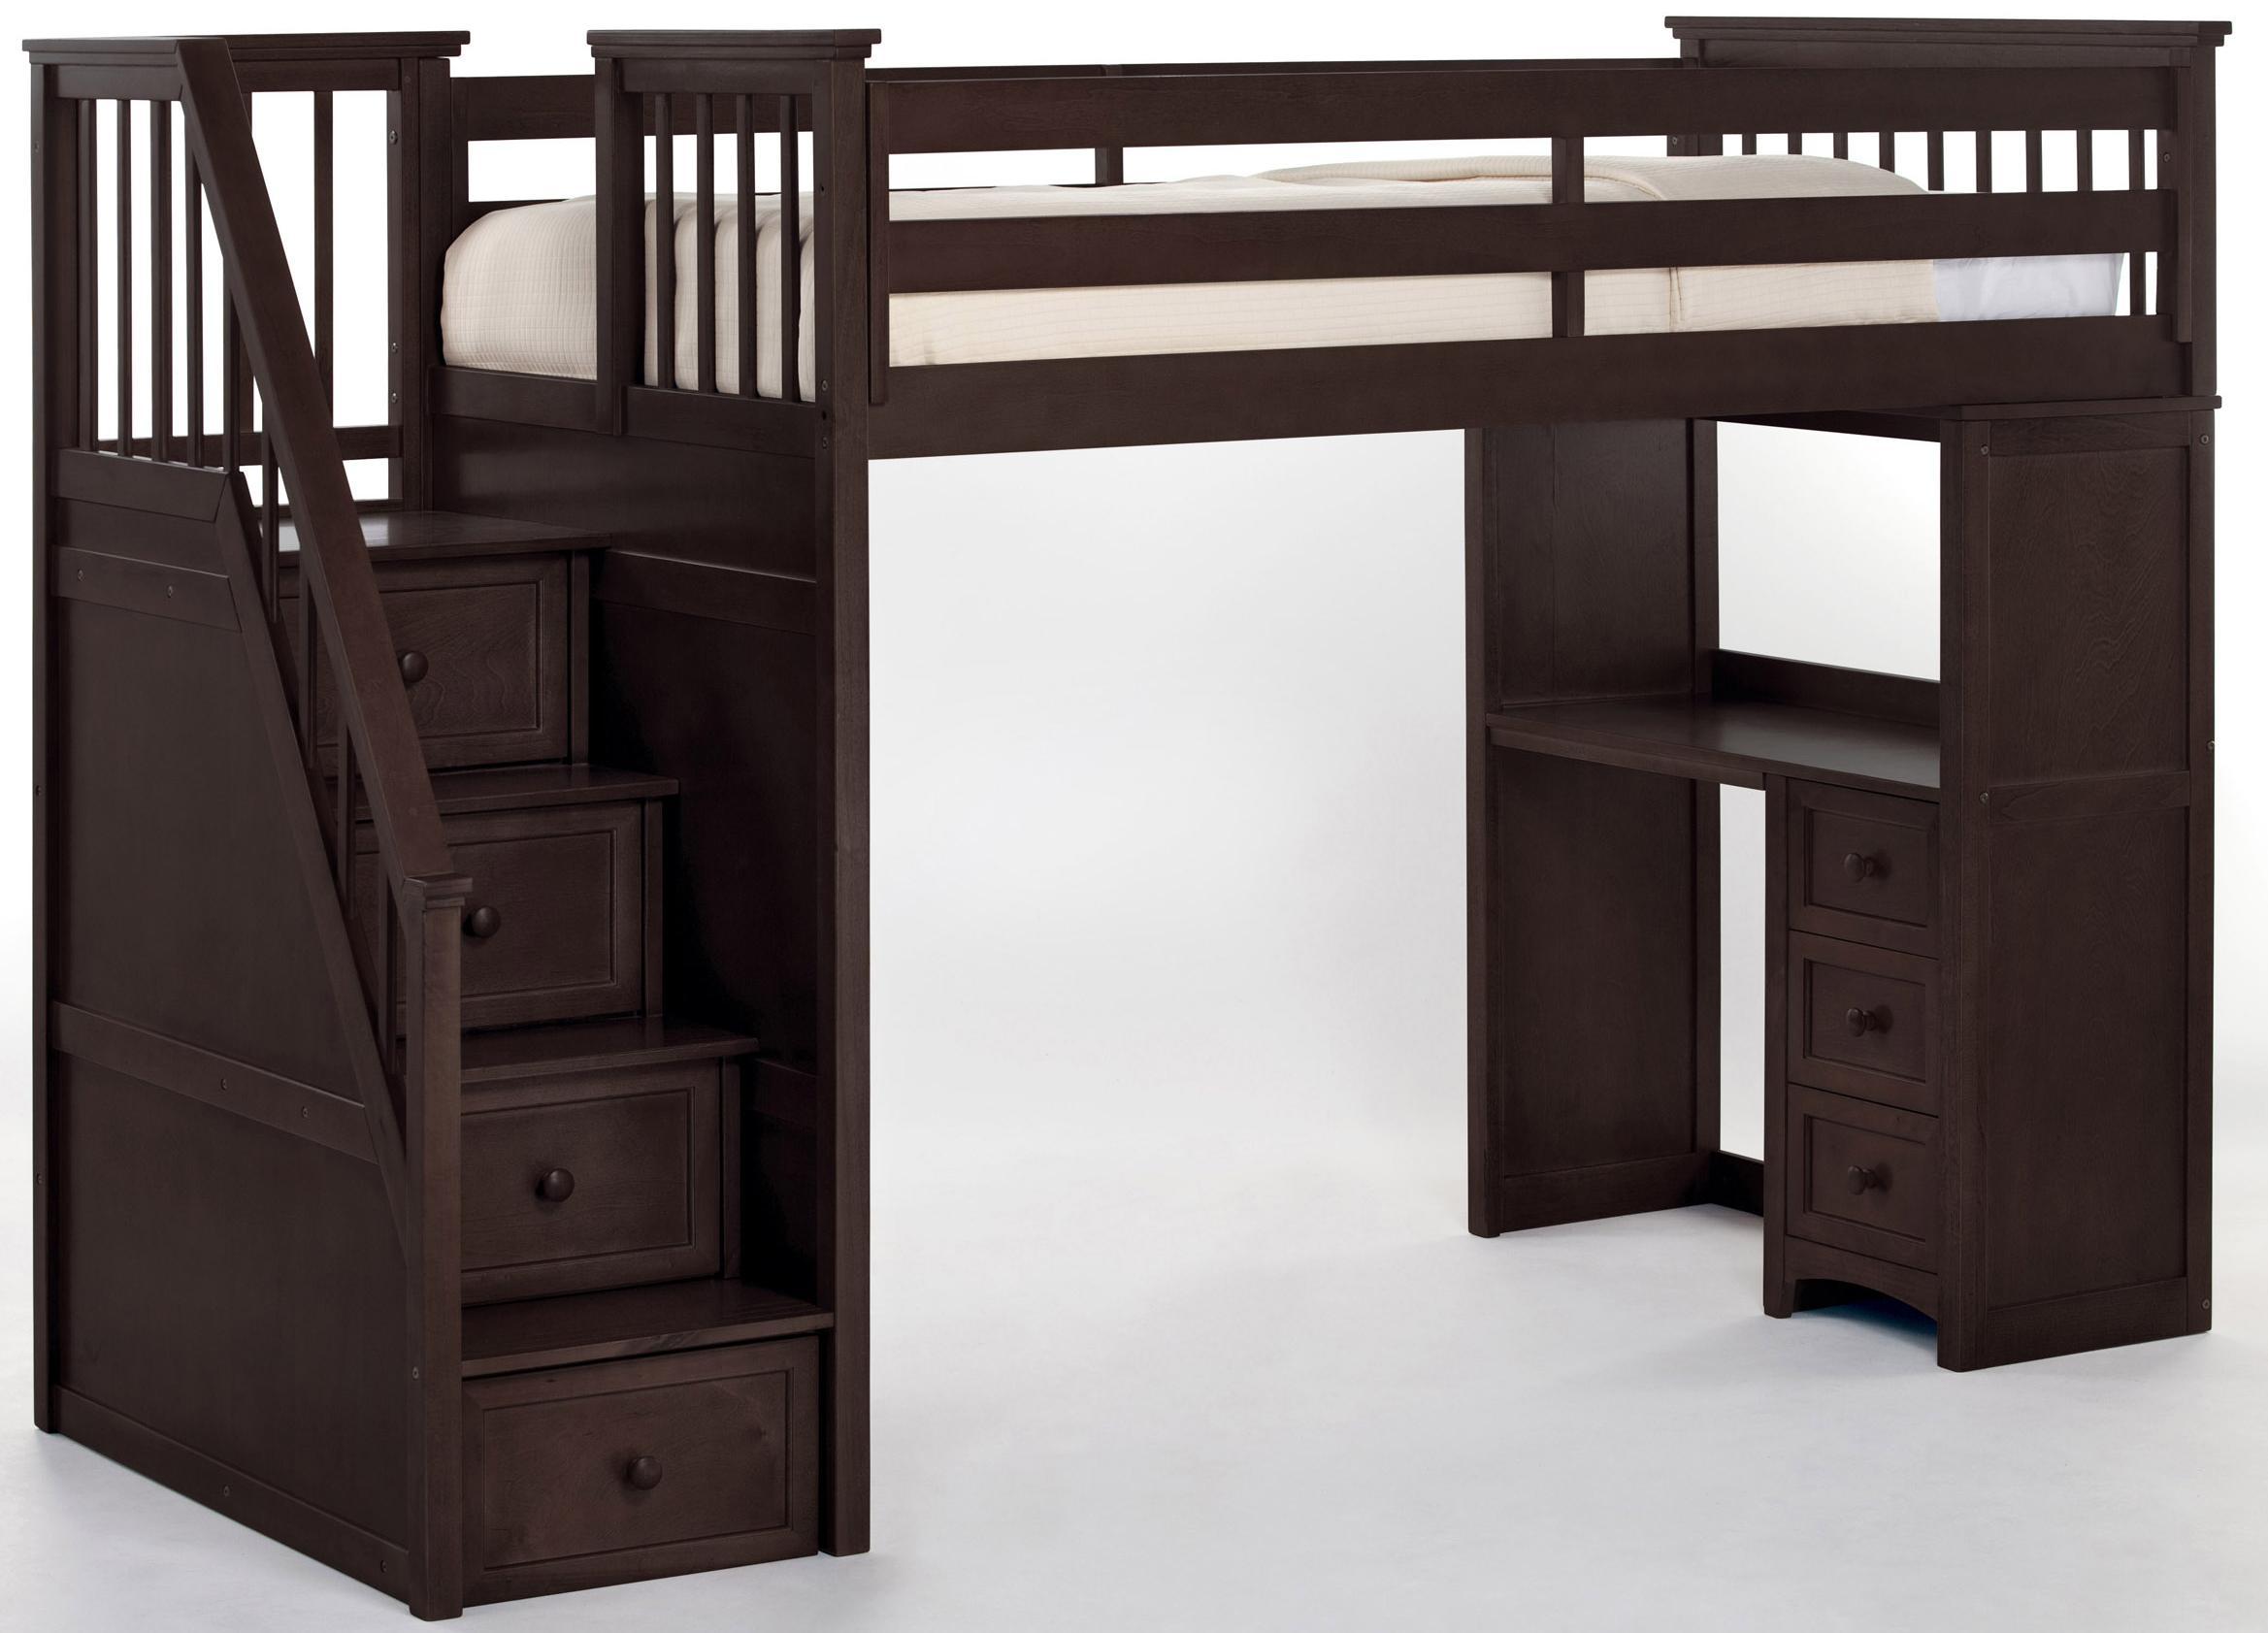 Ne Kids School House 5090nl Stair Loft Bed W Desk Dunk